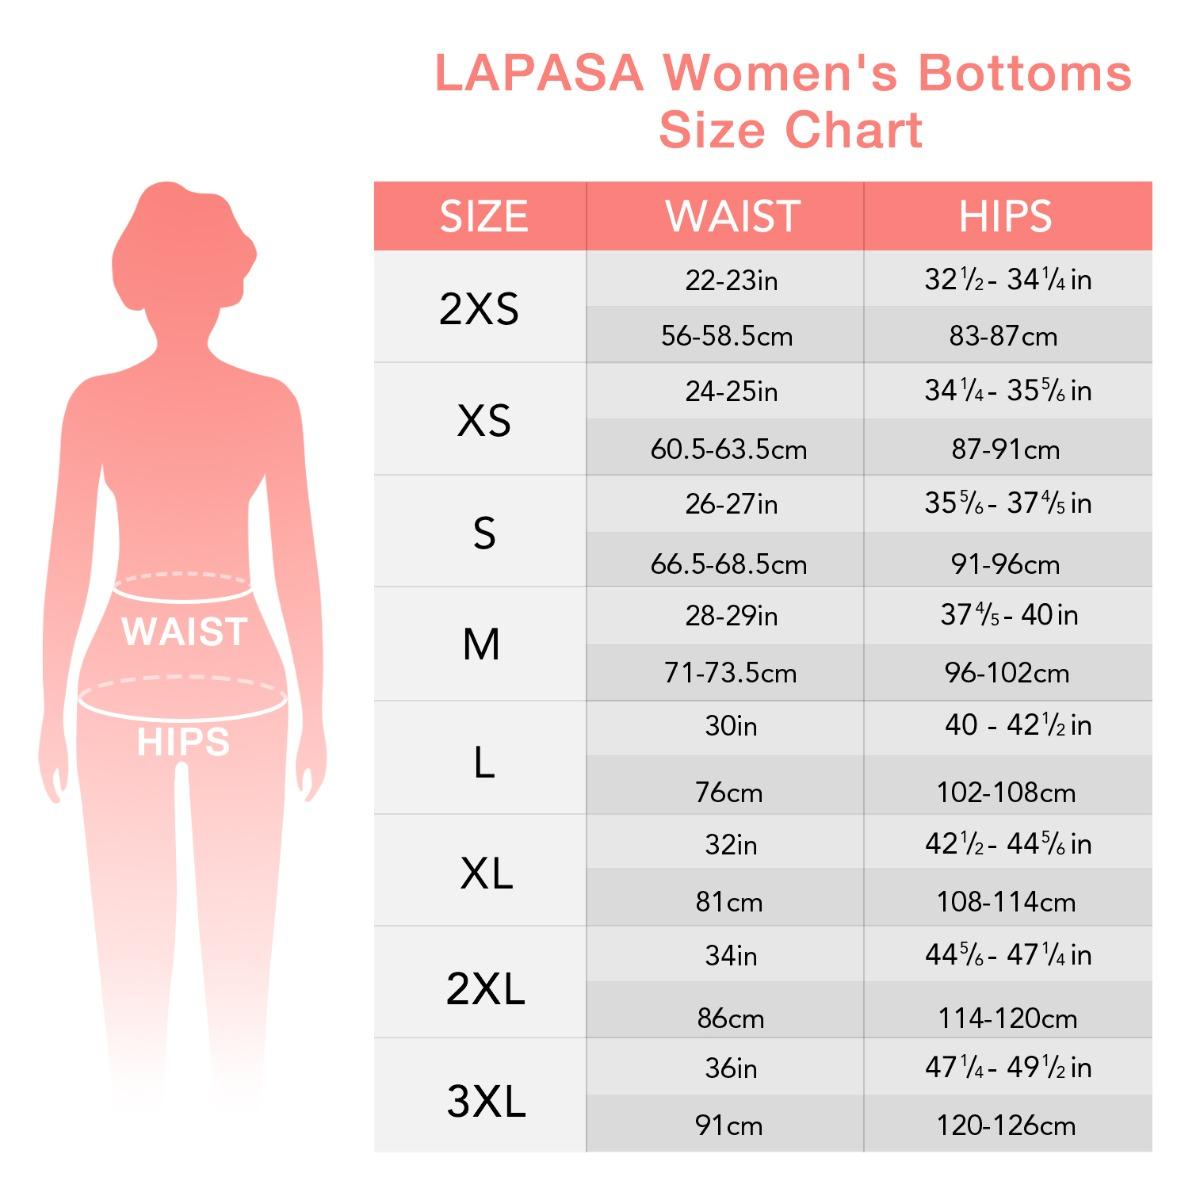 US  women's bottom size chart